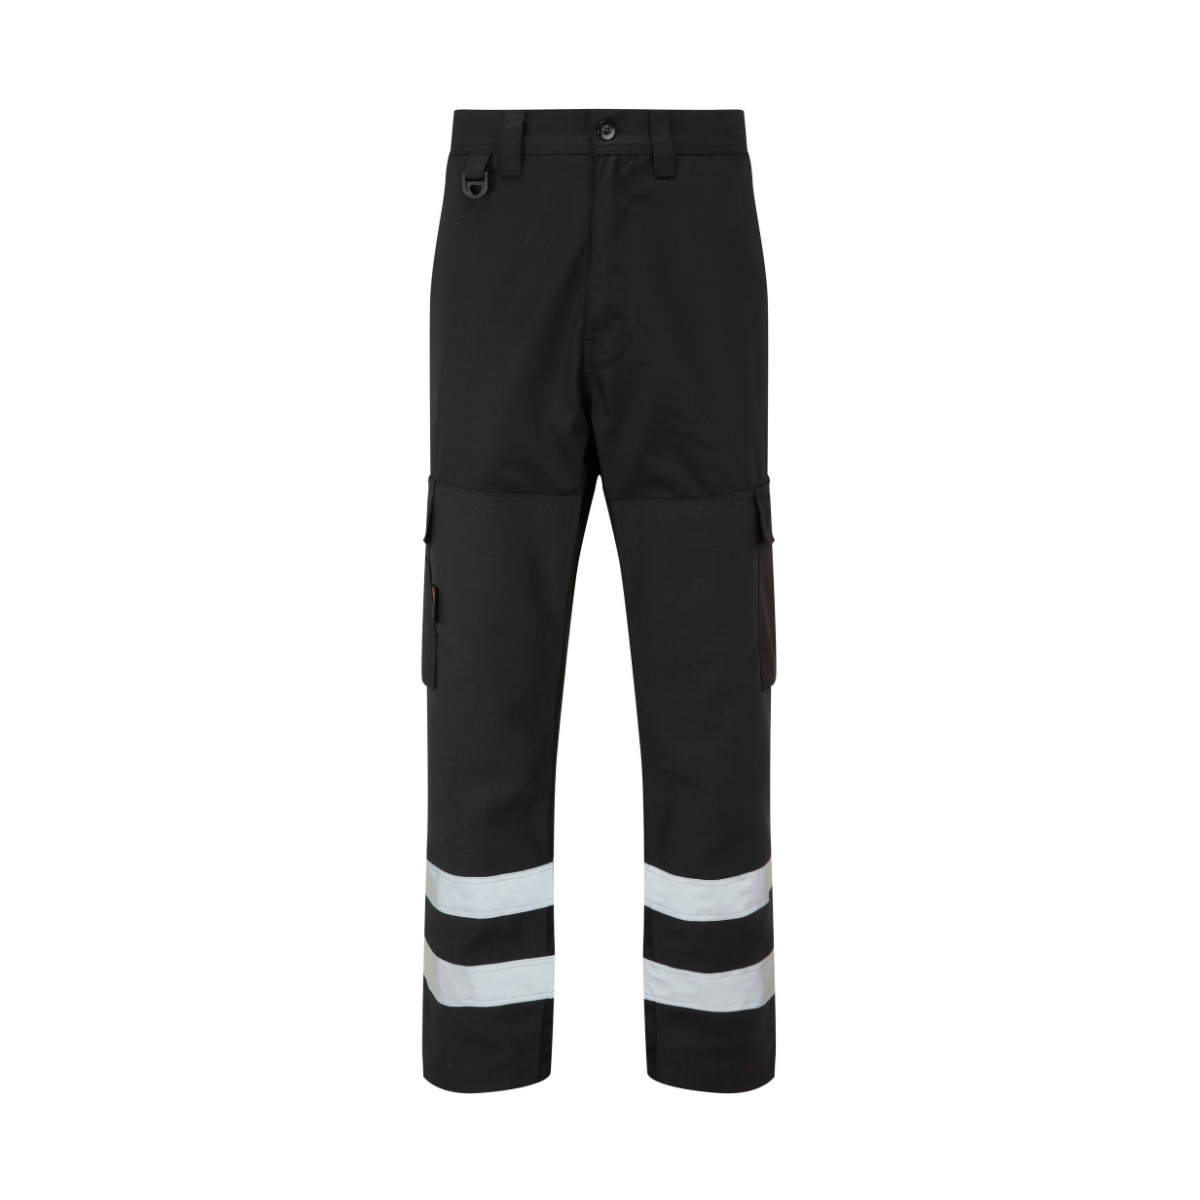 TR1848_HAZTEC® Tempa 80% Ballistic Trouser - Black_Front